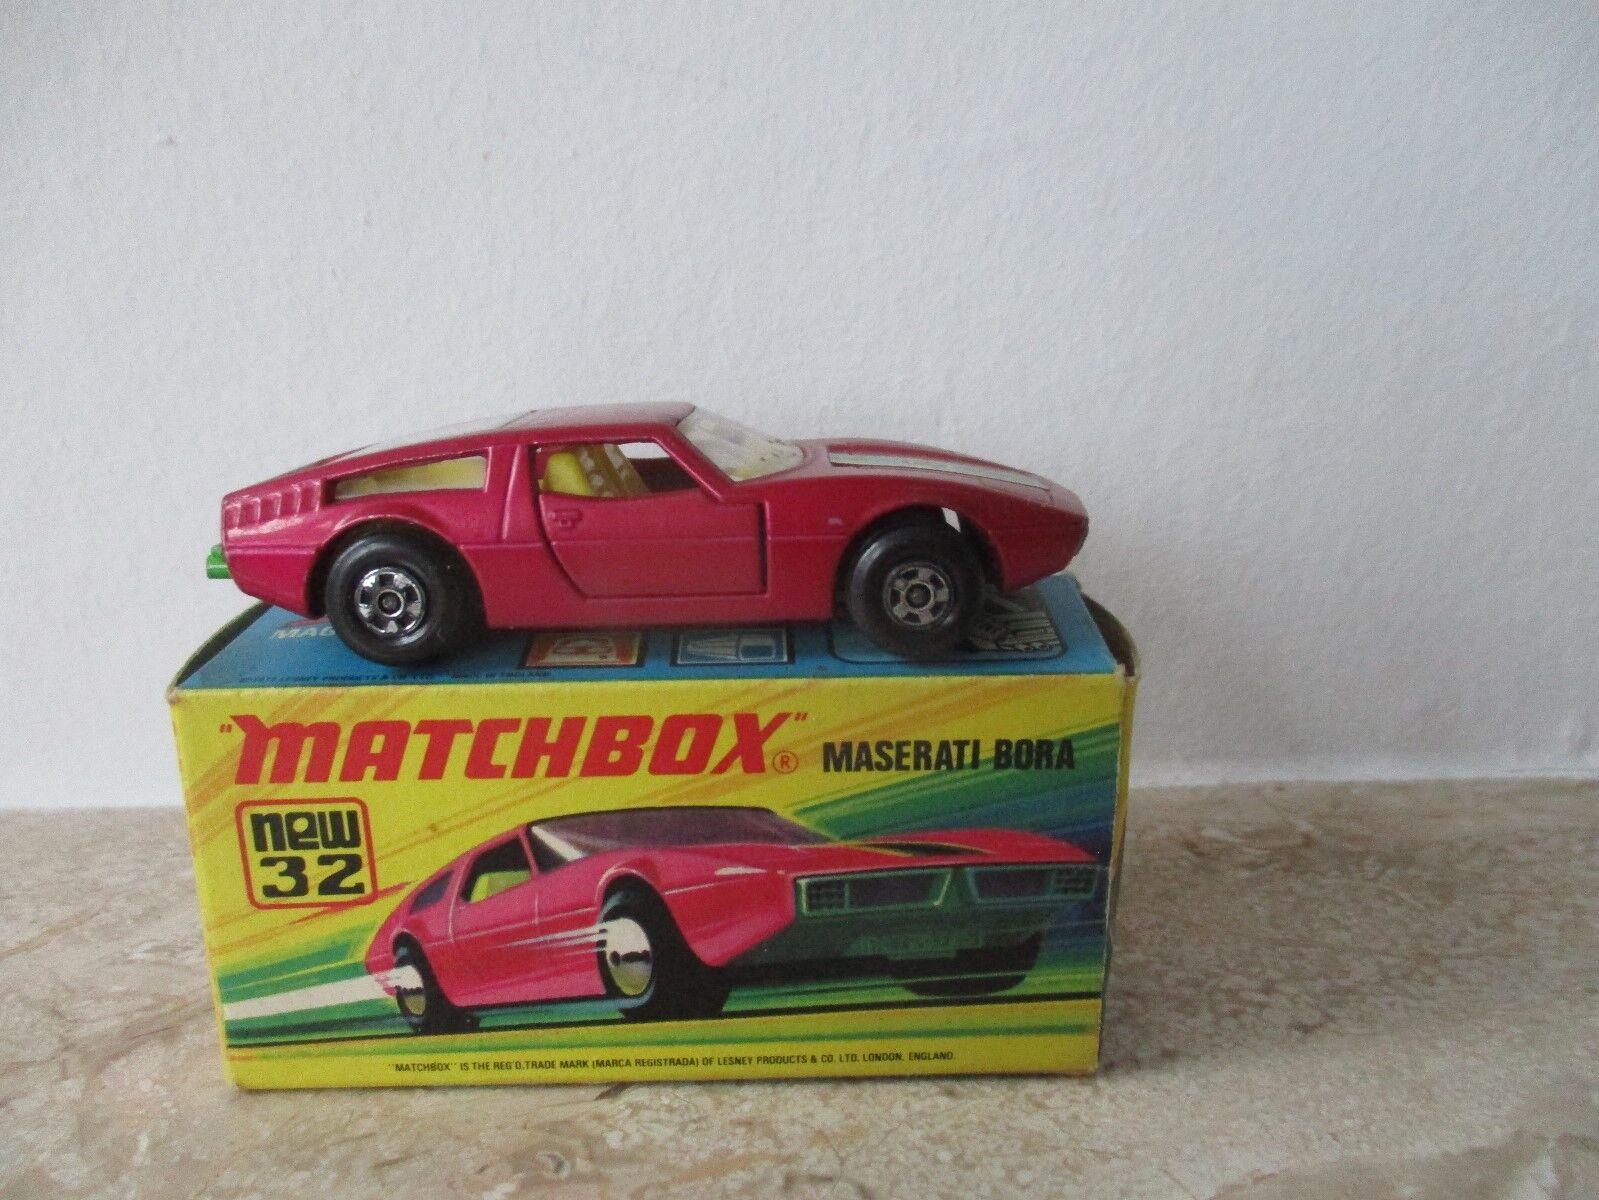 Altes MATCHBOX Superfast Nr.32 MASERATI BORA mit OVP OVP OVP von 1972 0a14ec